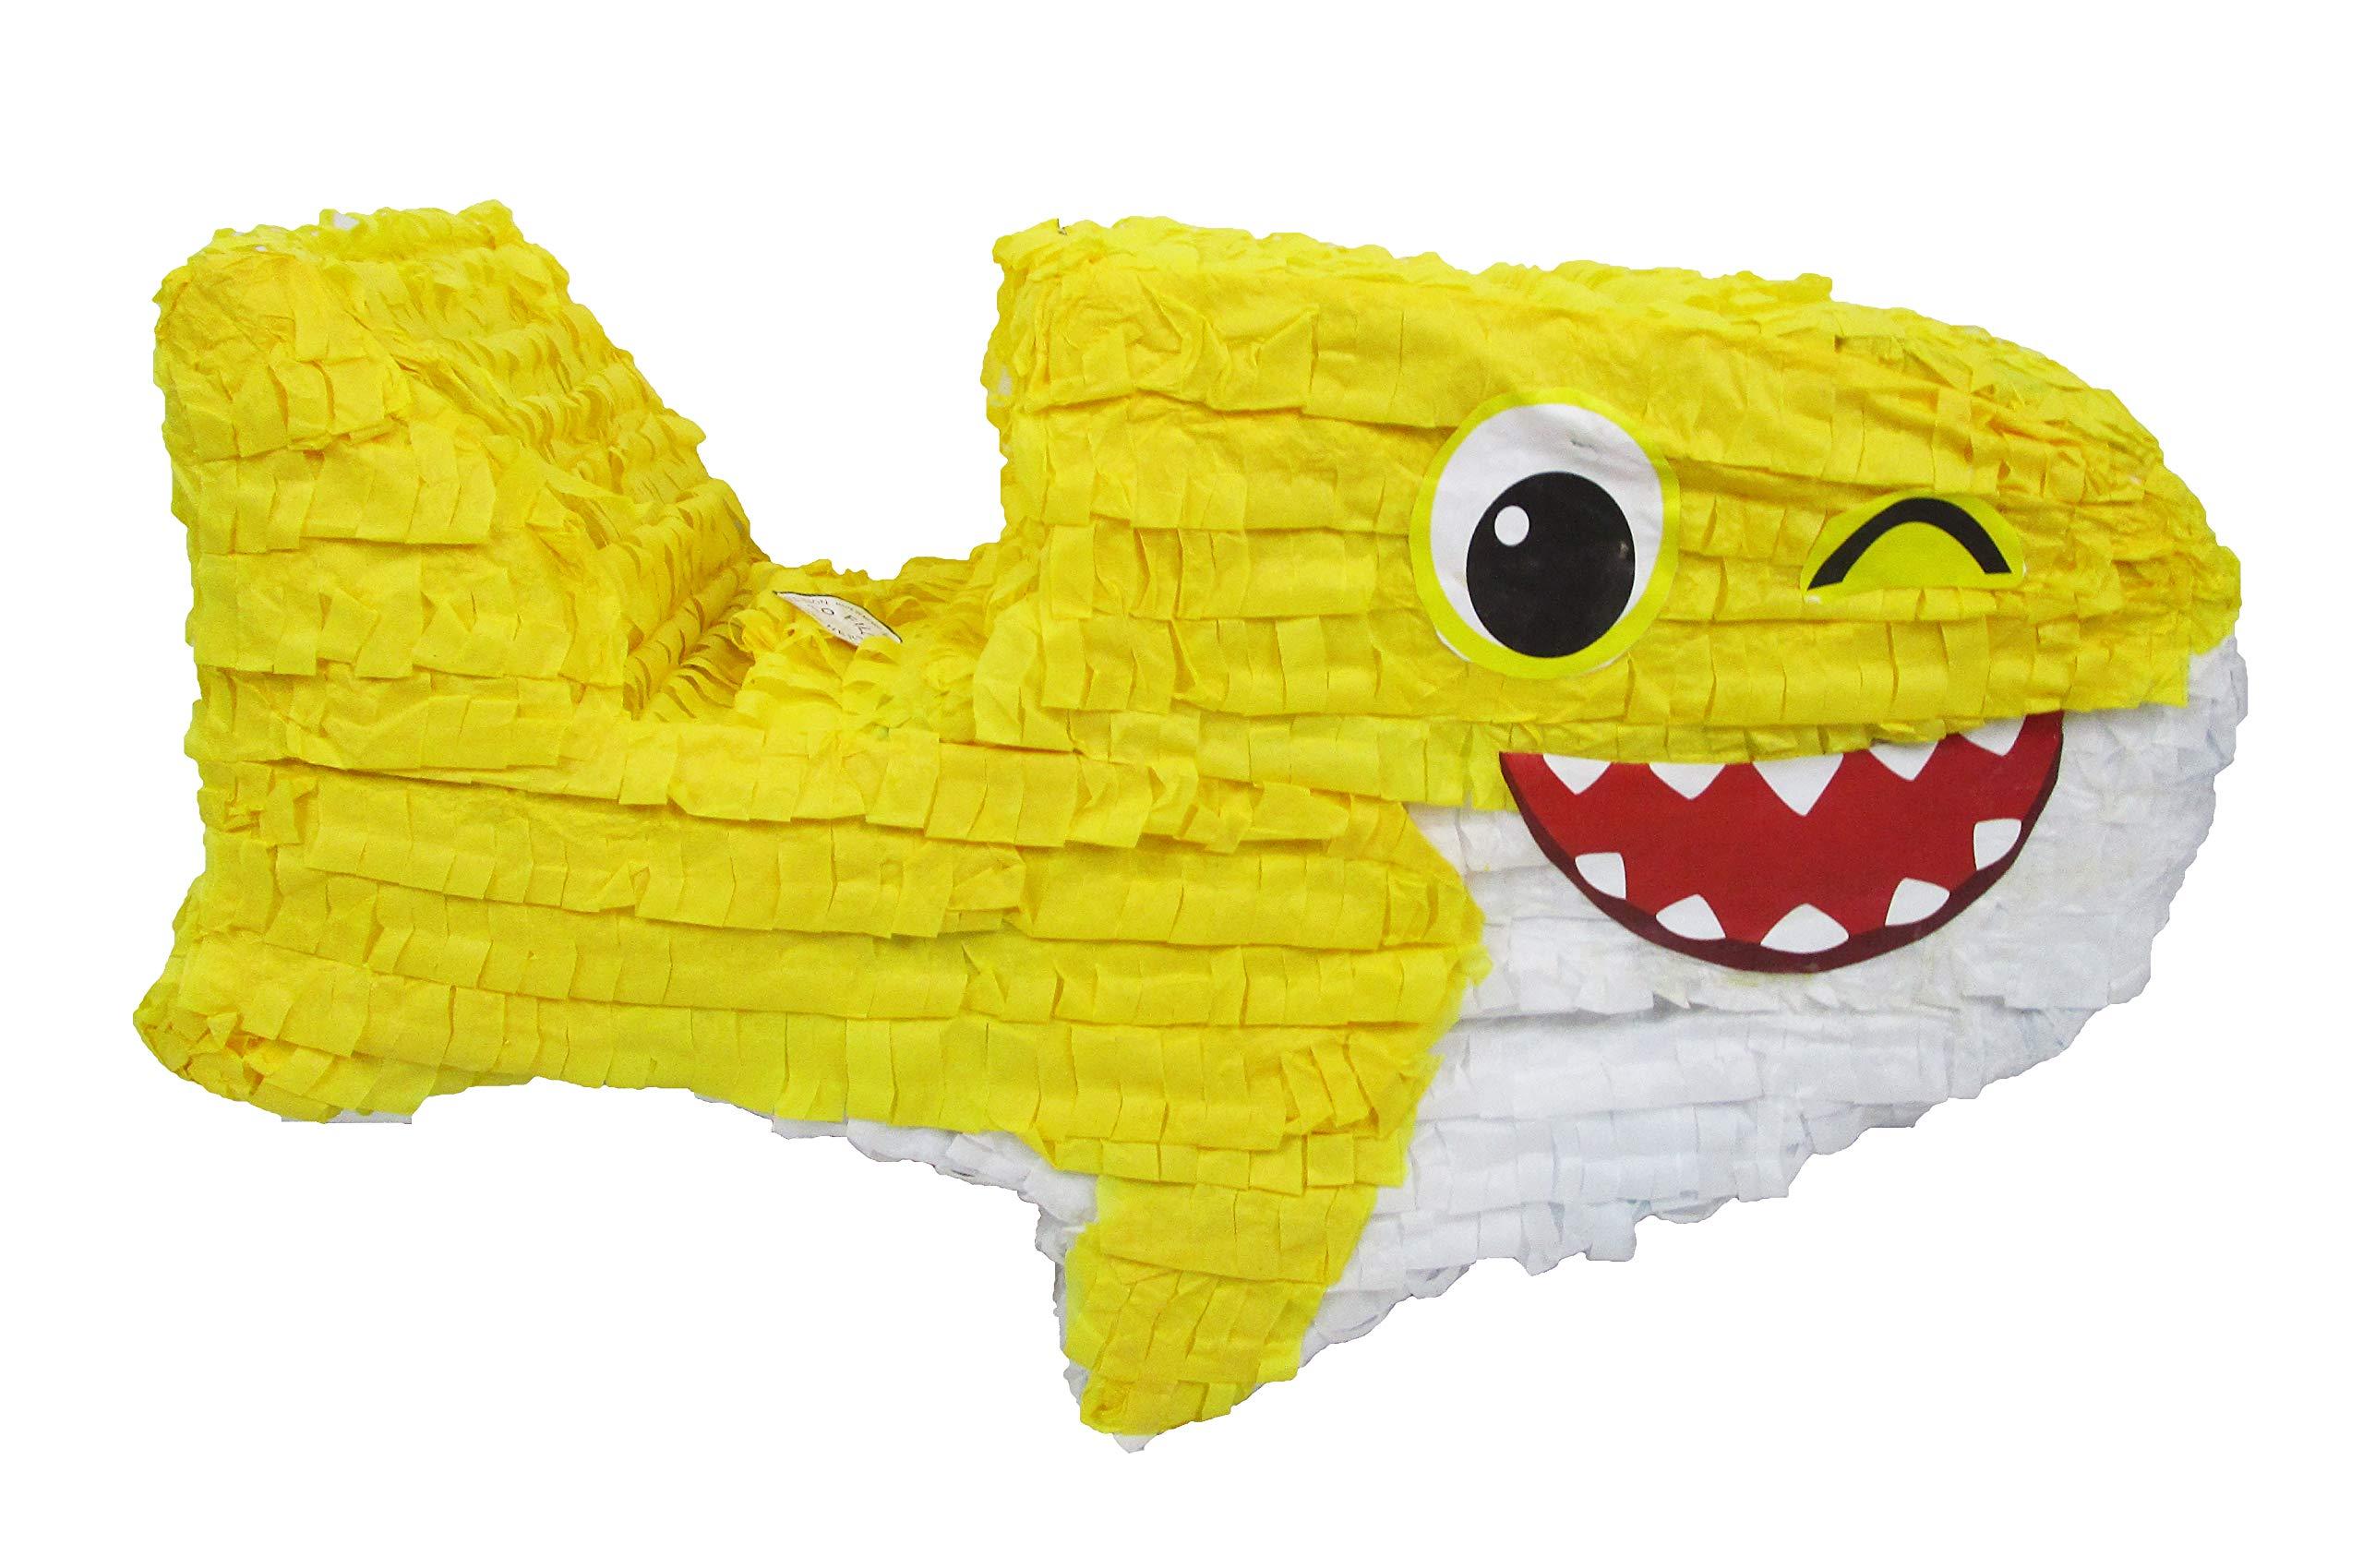 Baby Shark Pinata - Birthday Party Game and Handmade Decoration Centerpiece by Pinatas